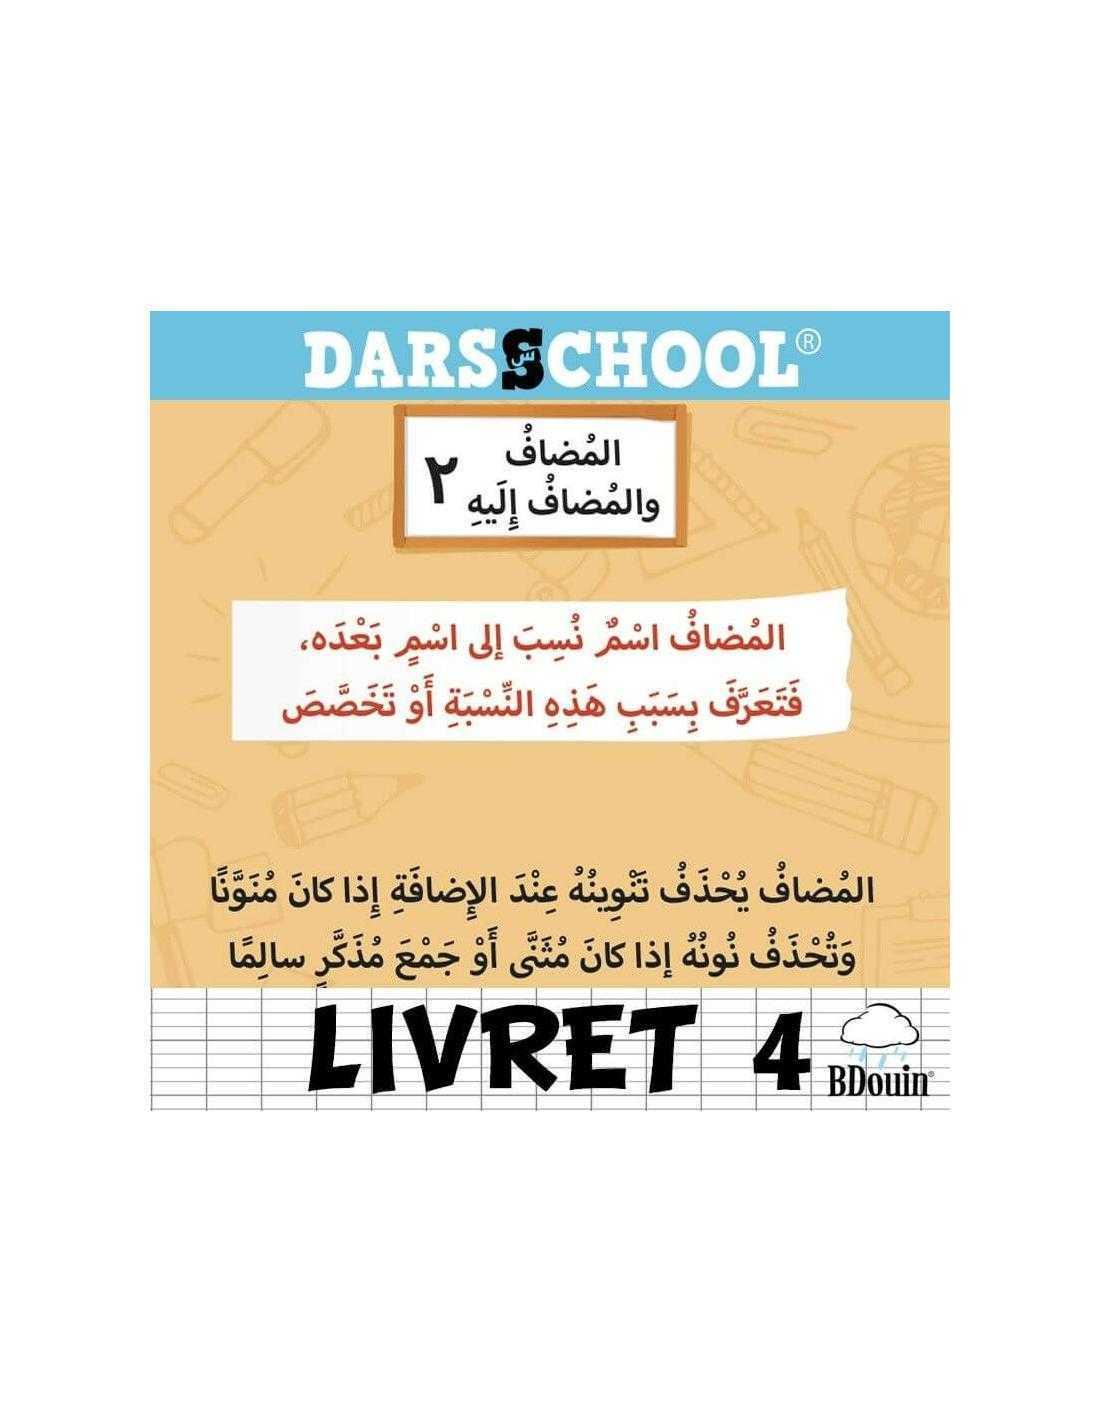 DARSSCHOOL tome de medine  - Livre 4